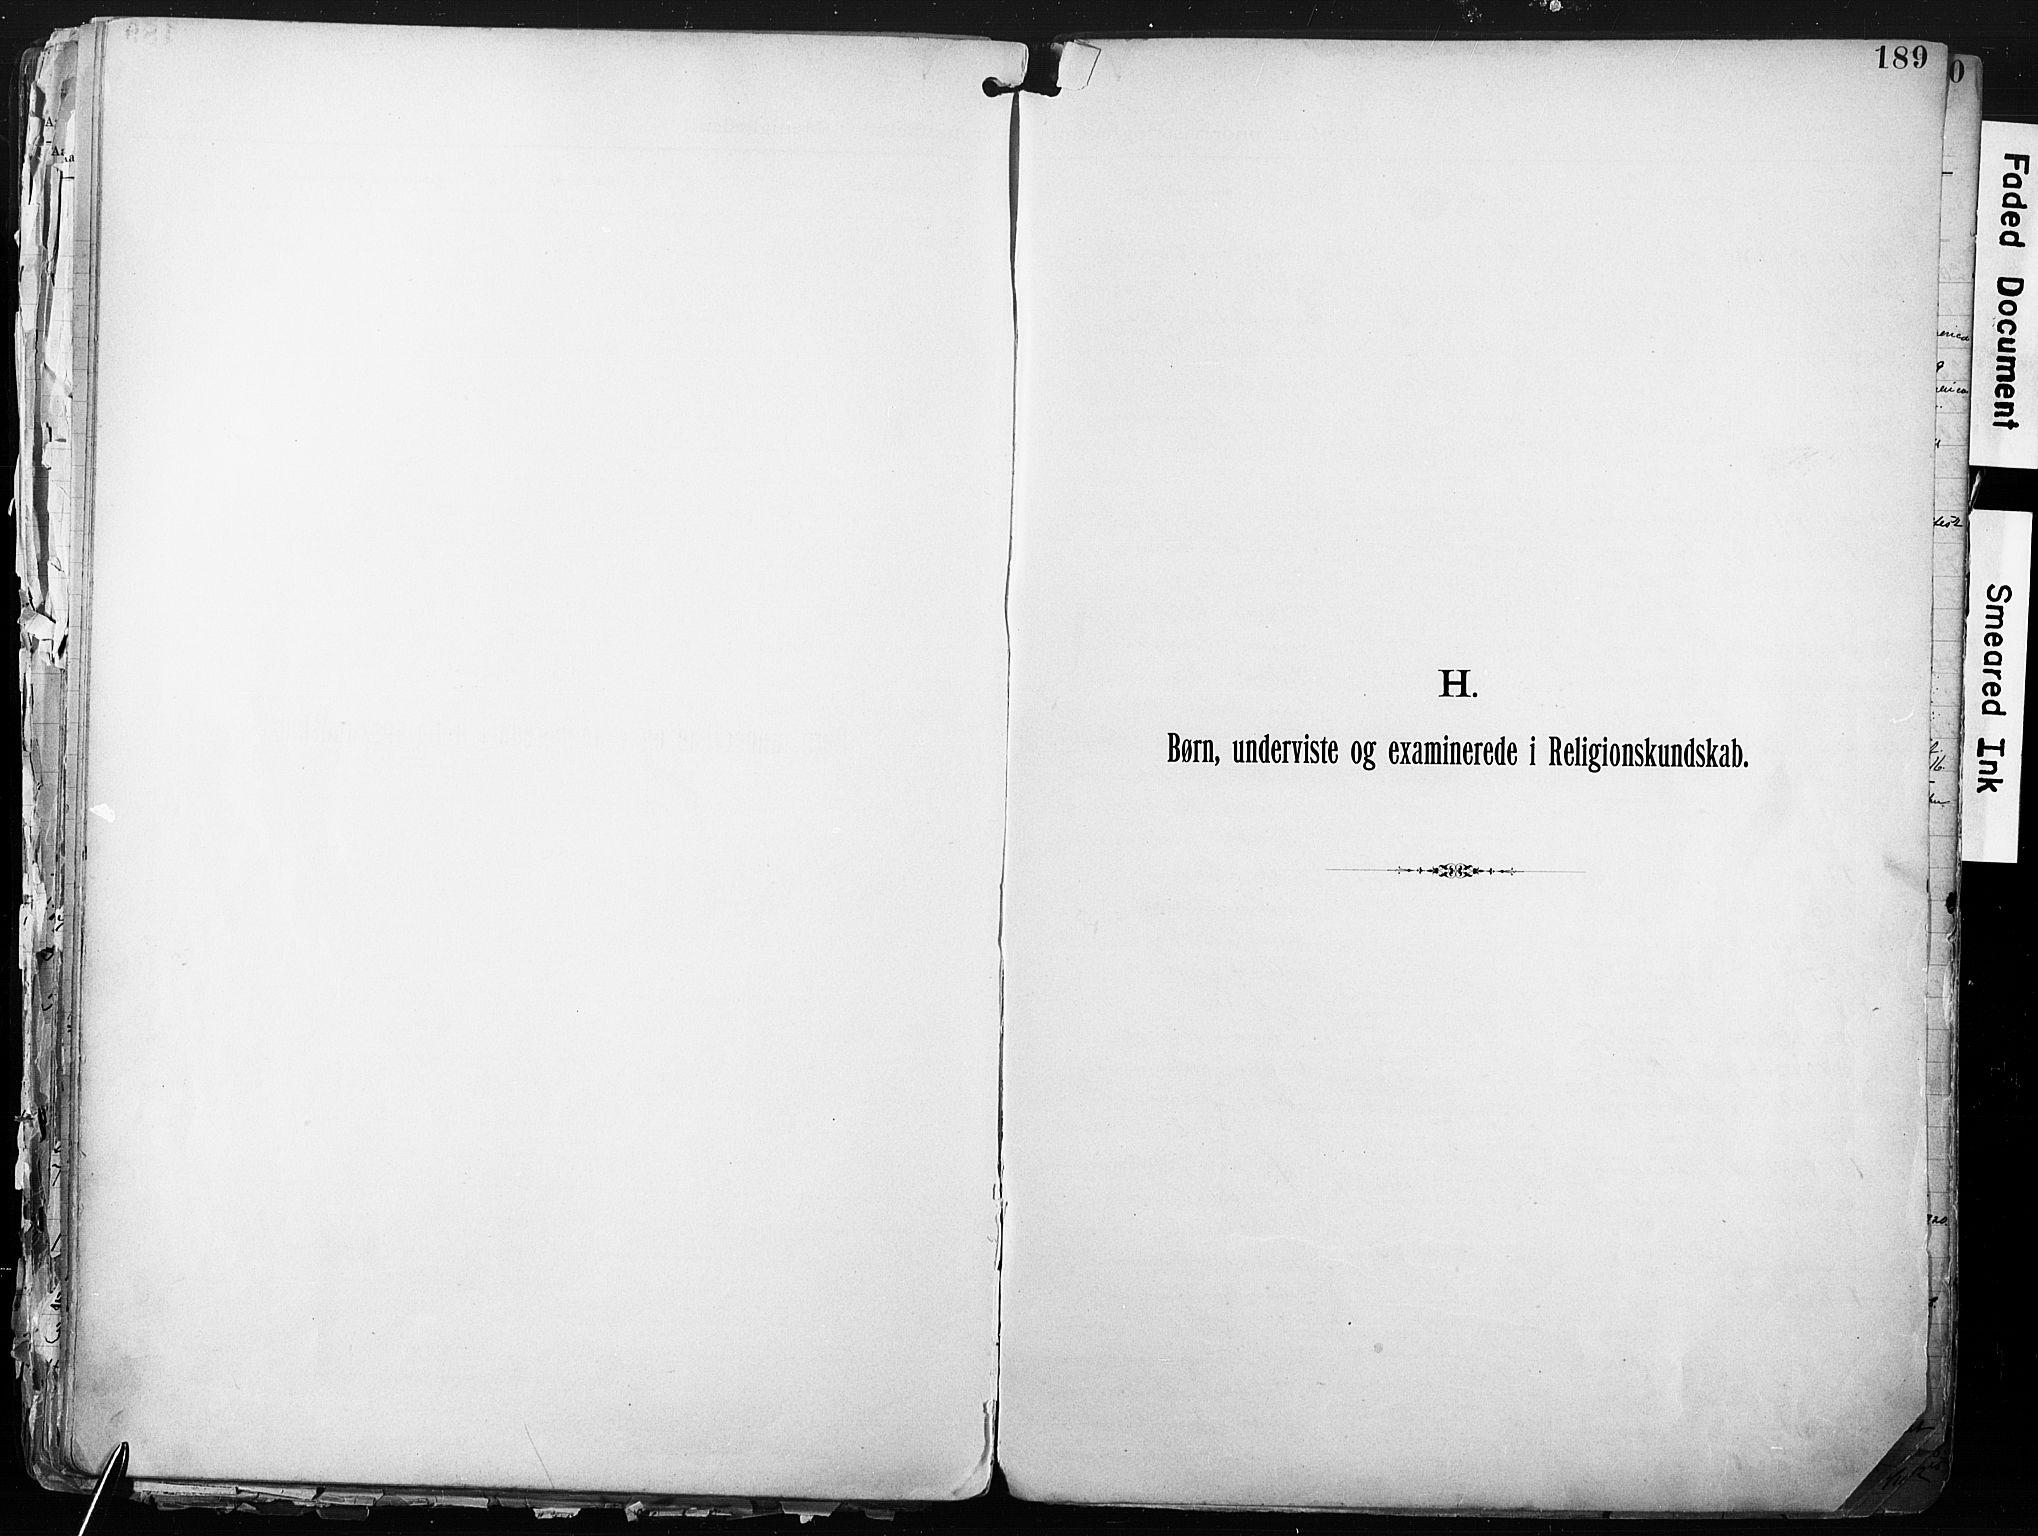 SAO, Sarpsborg metodistkirke, A/L0004: Dissenter register no. 4, 1892-1923, p. 189